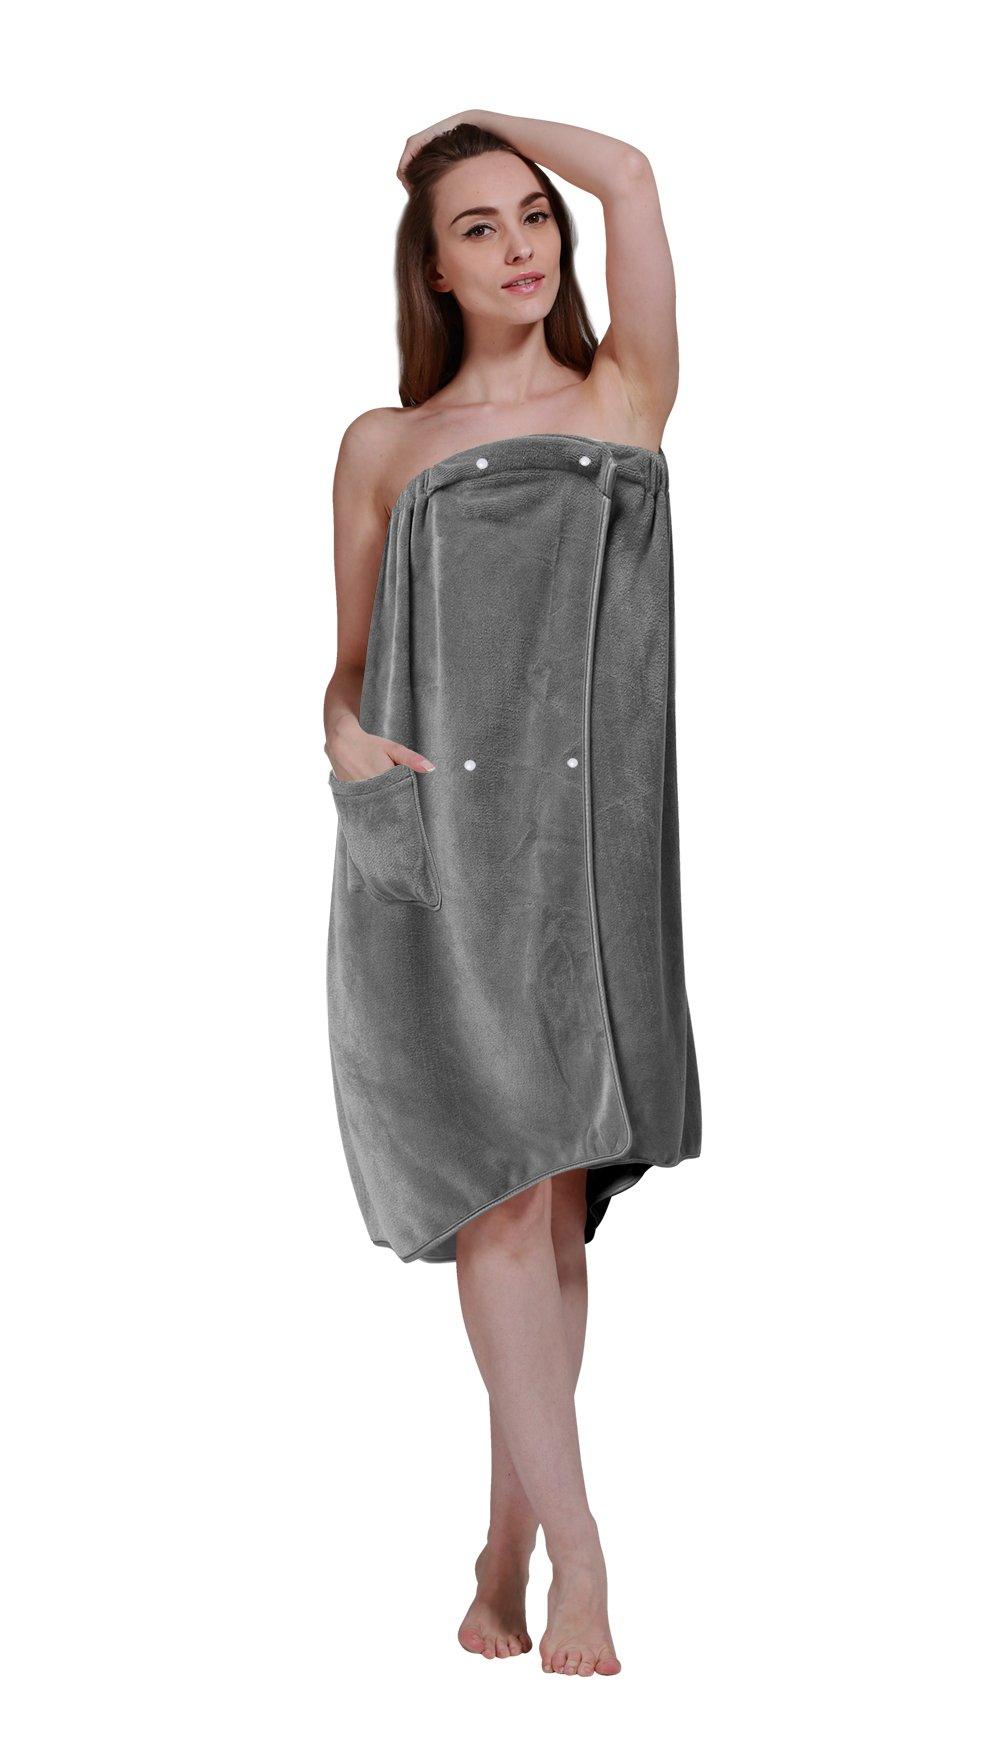 Sinland Microfiber Women's Spa Wrap Towel Bath Towel with Snap Closure (27inchx53inch, Grey)